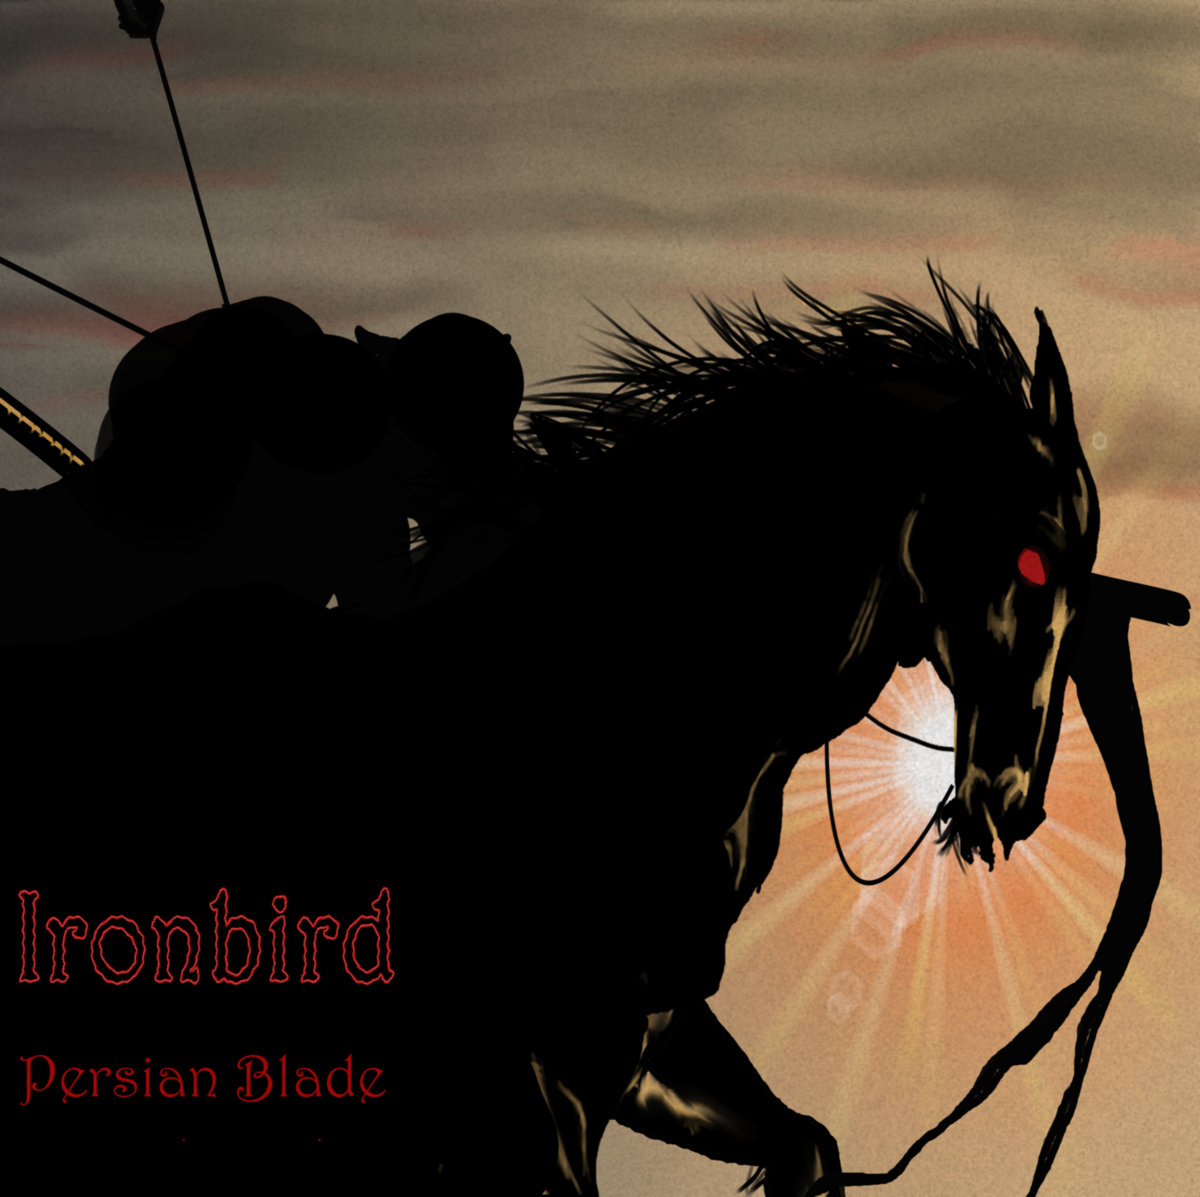 ironbird persian blade